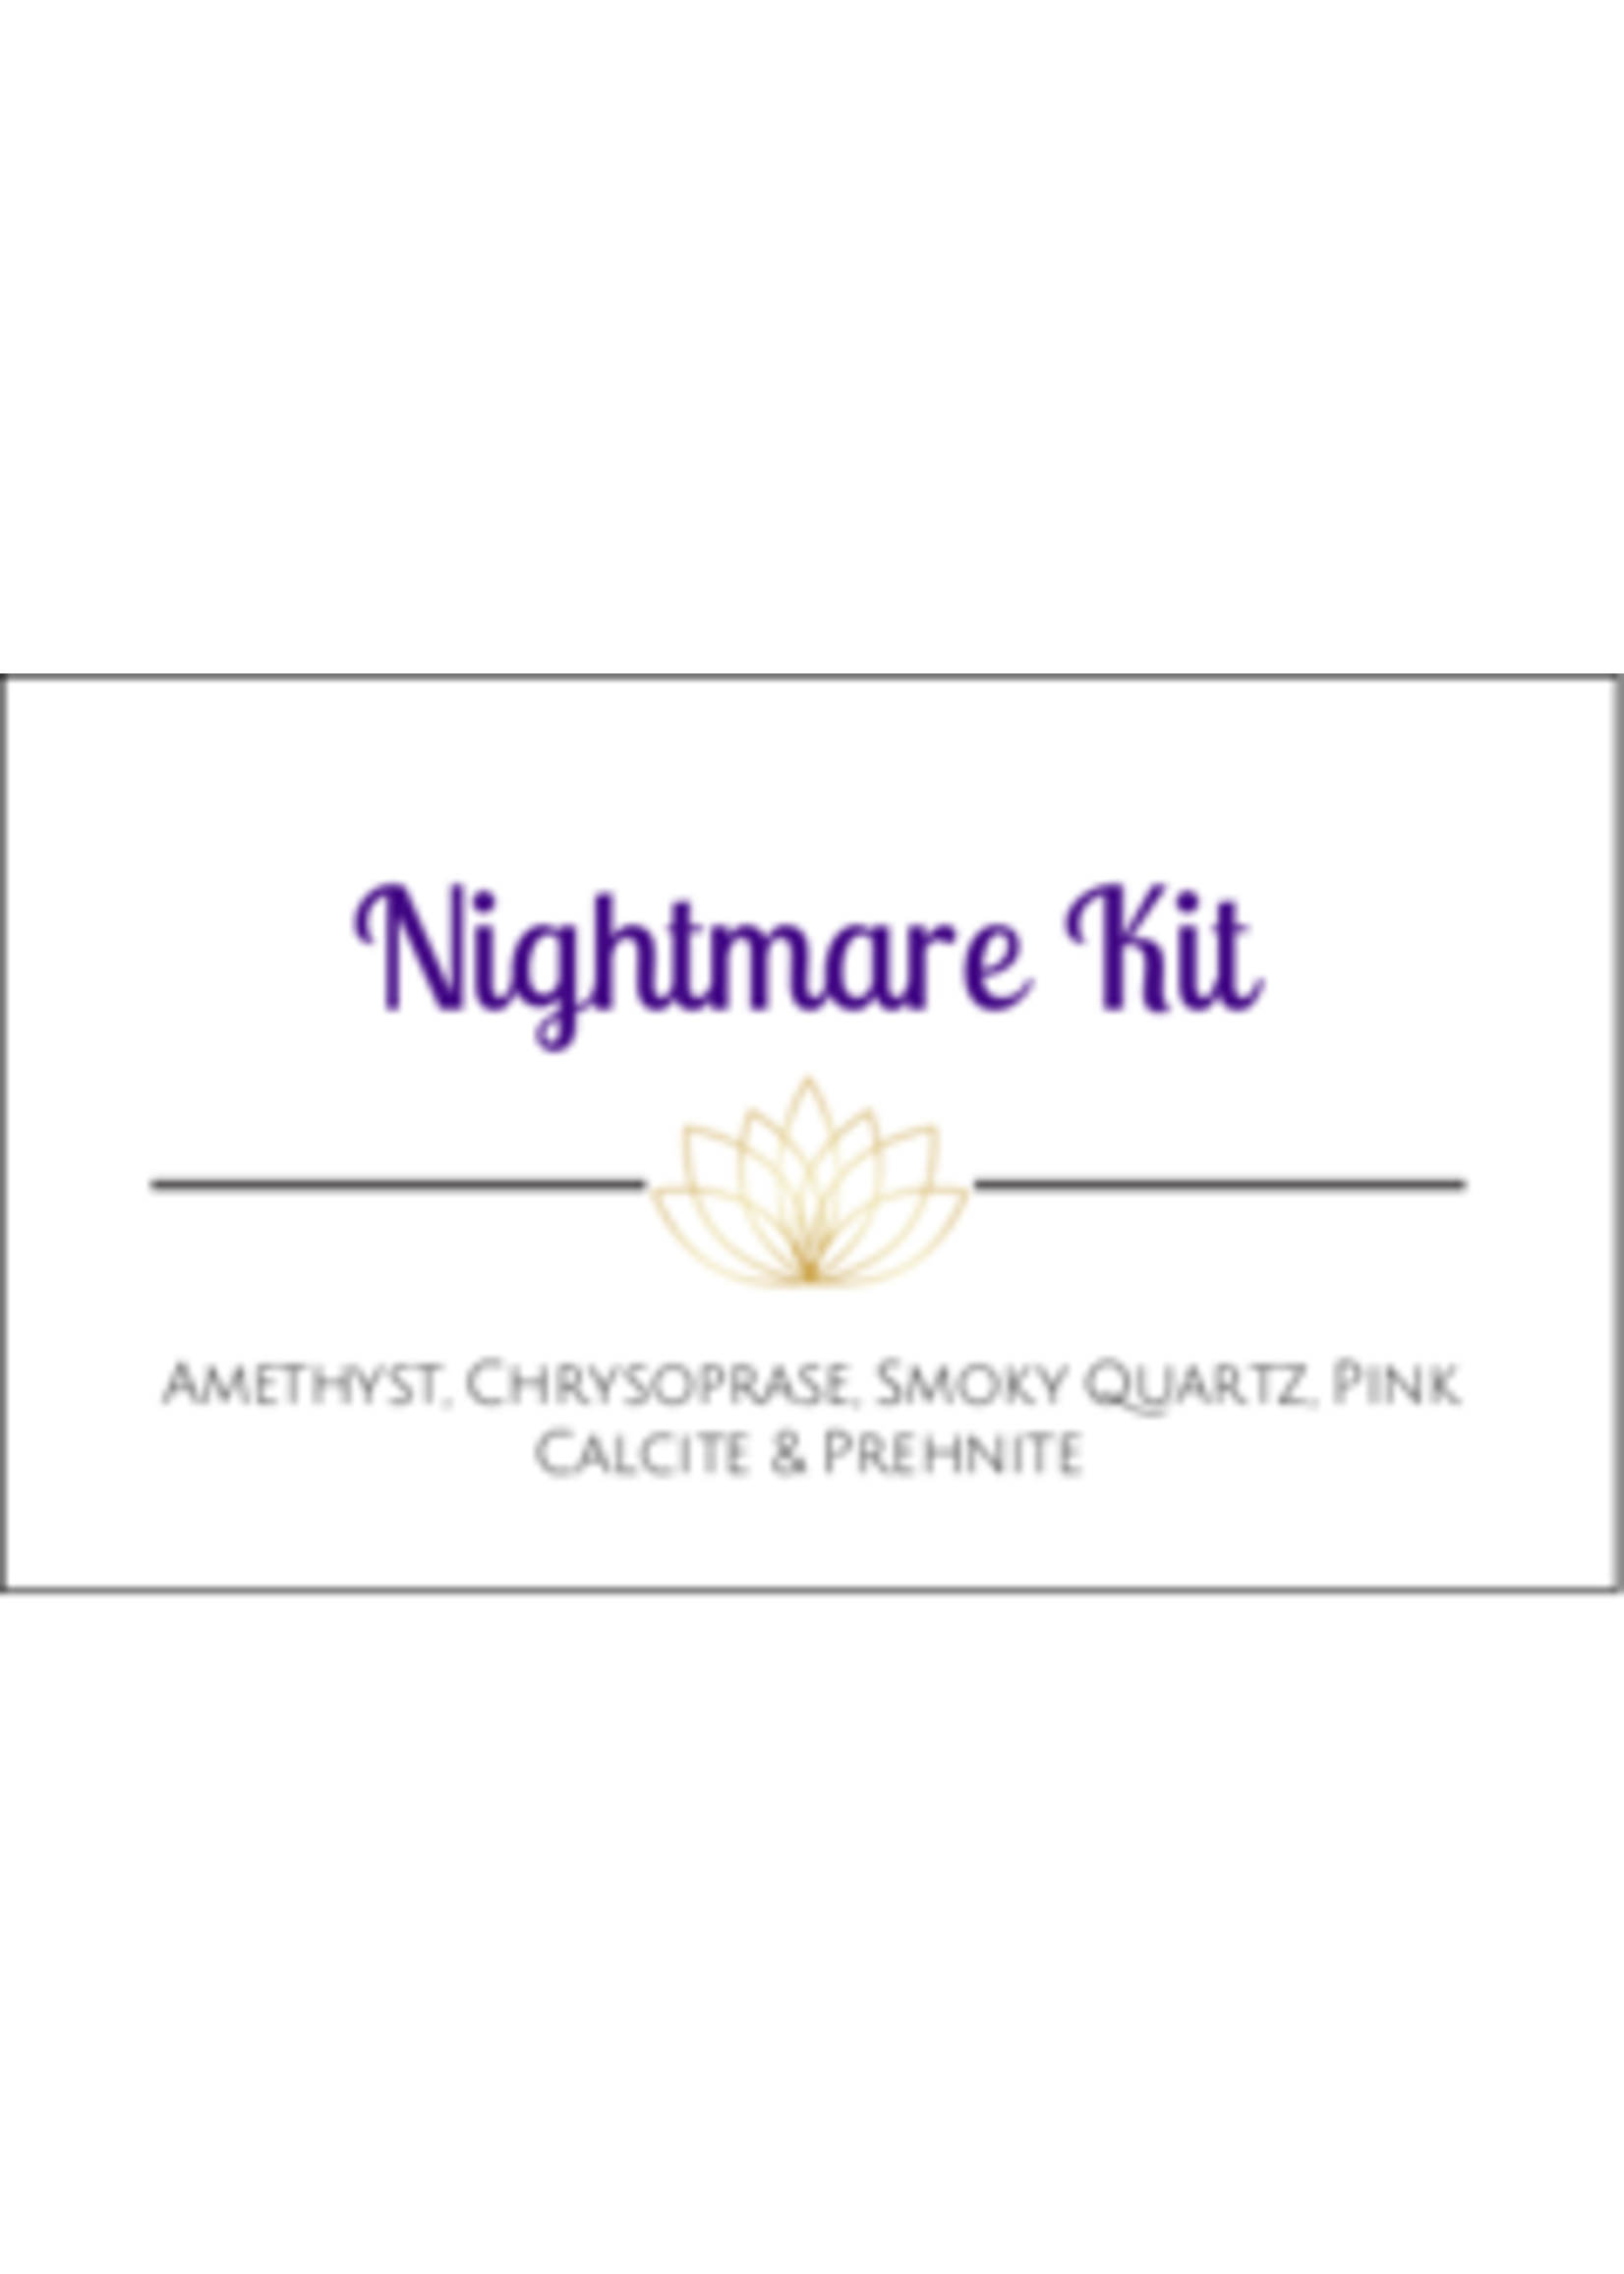 Nightmare Crystal Kit Cards - Box of 100